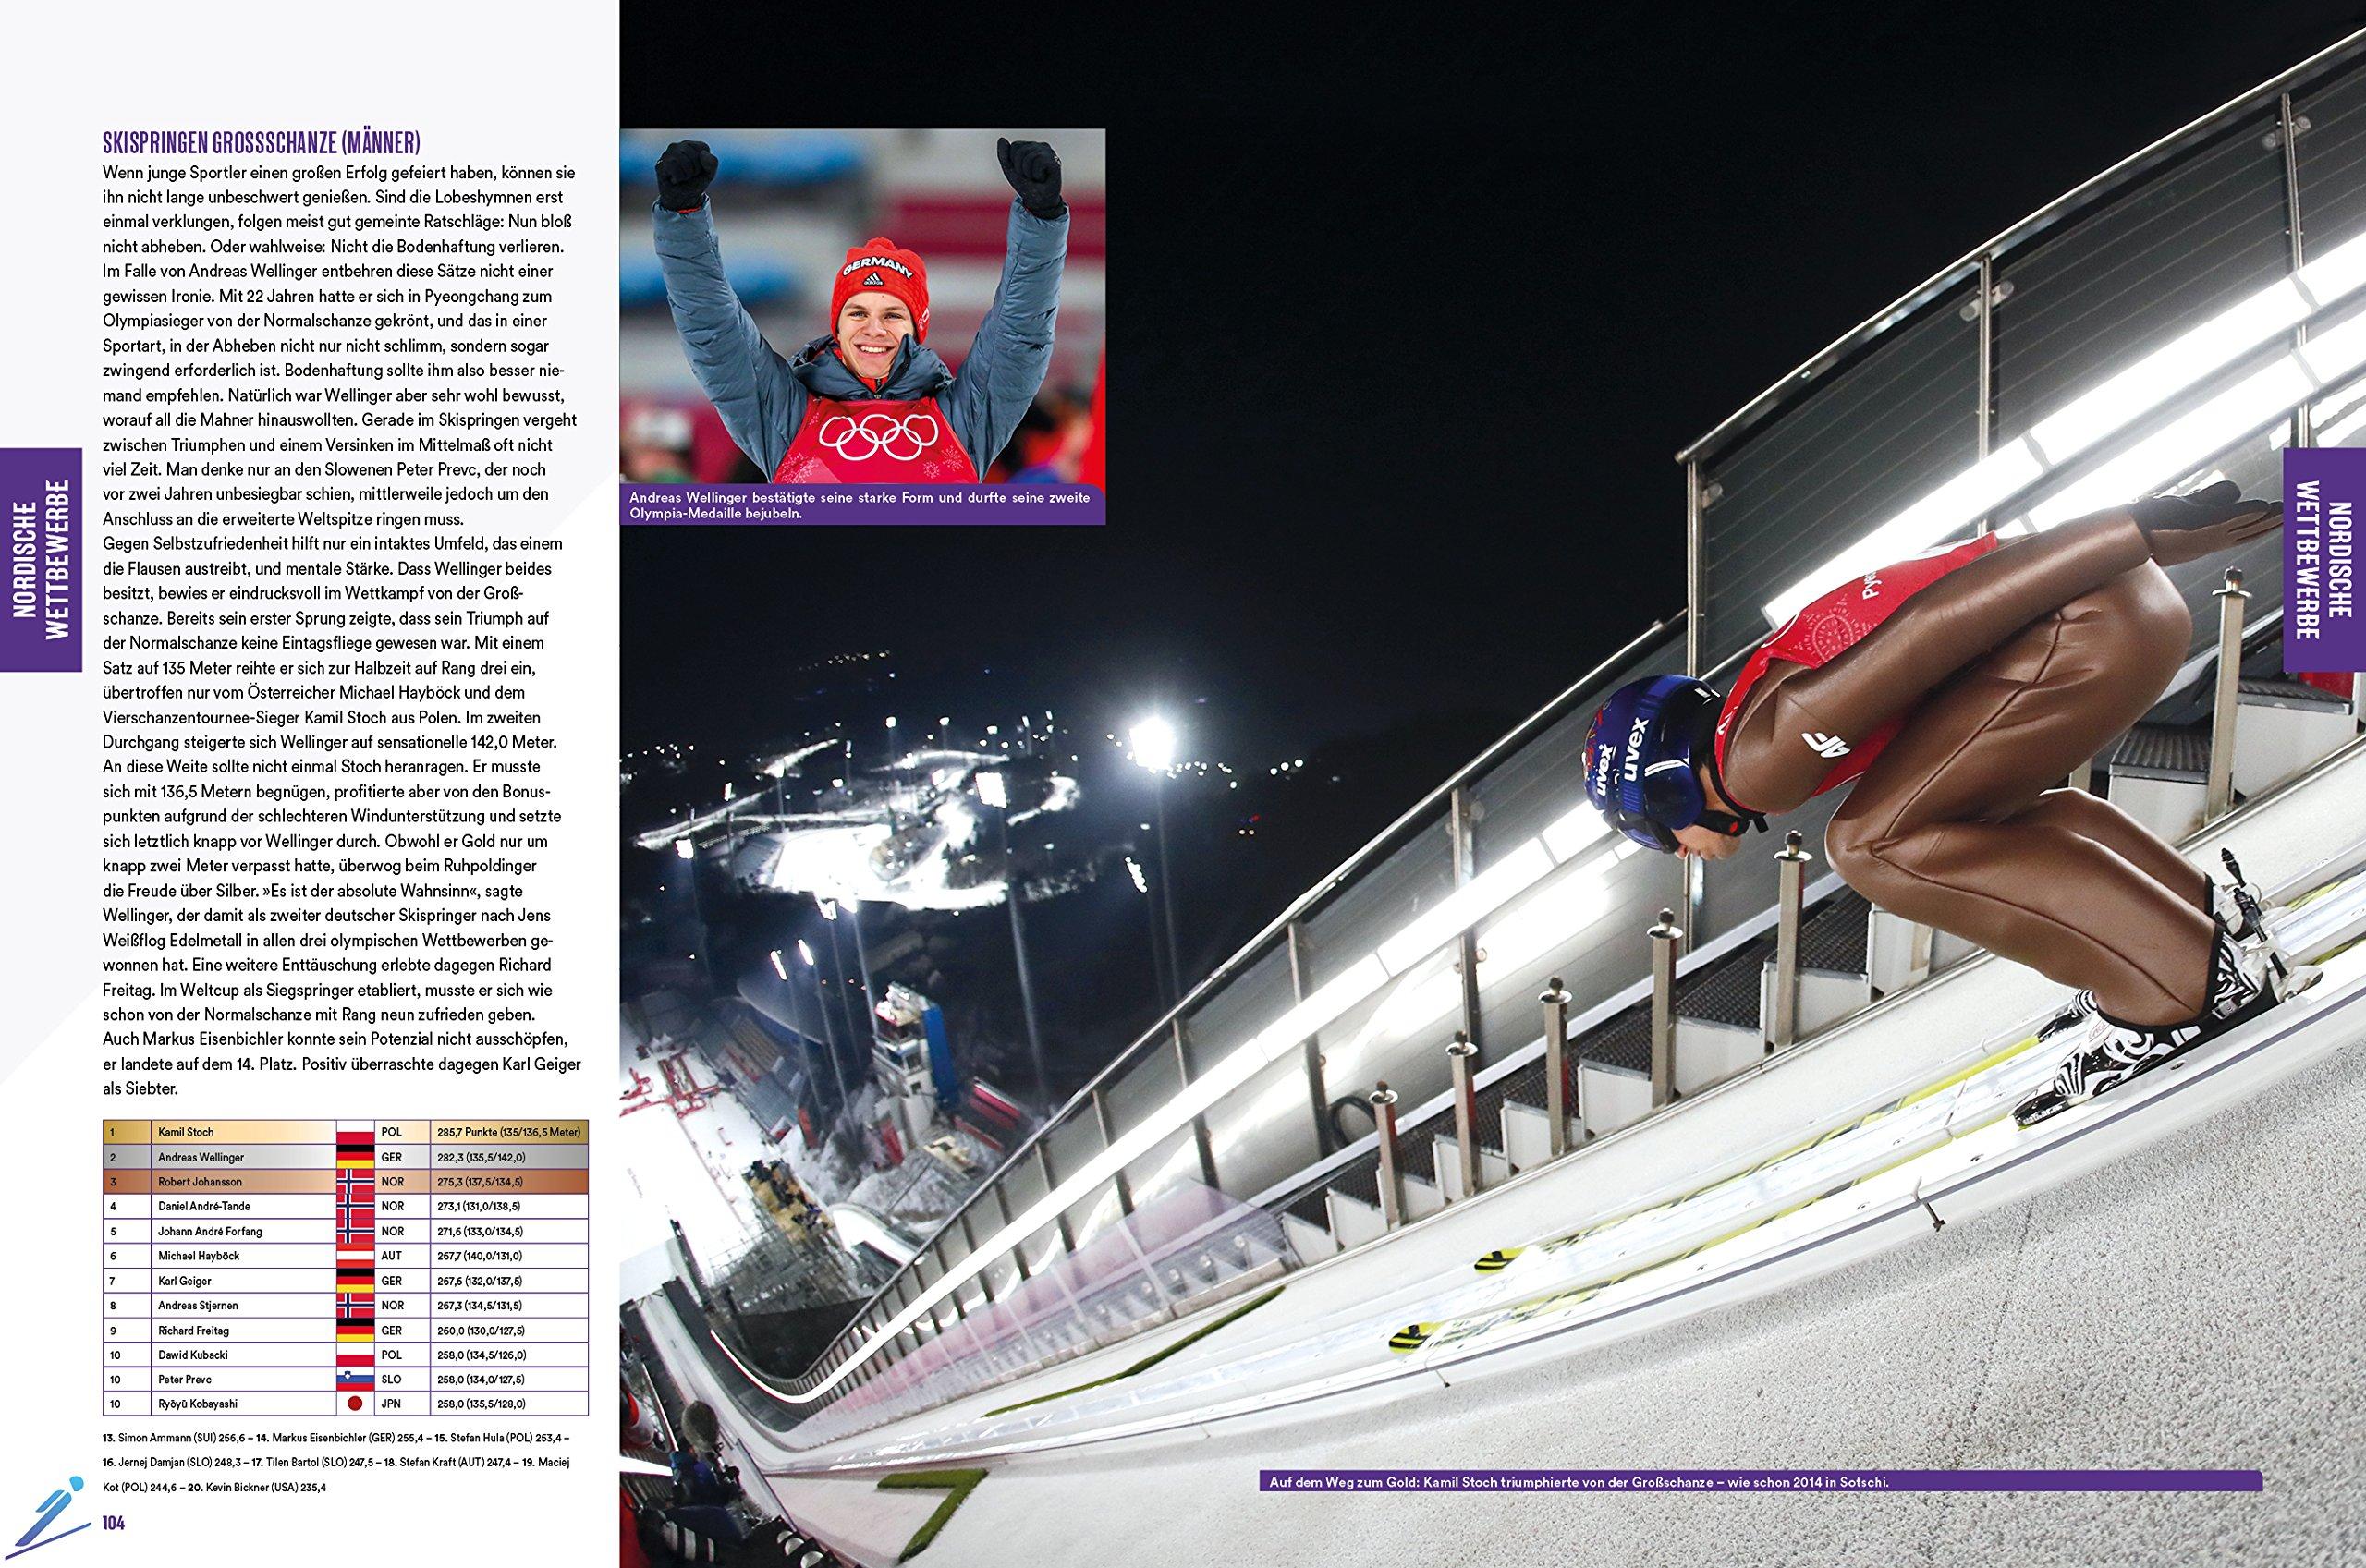 Olympische Winterspiele Pyeongchang 2018 Das Offizielle Eurosport